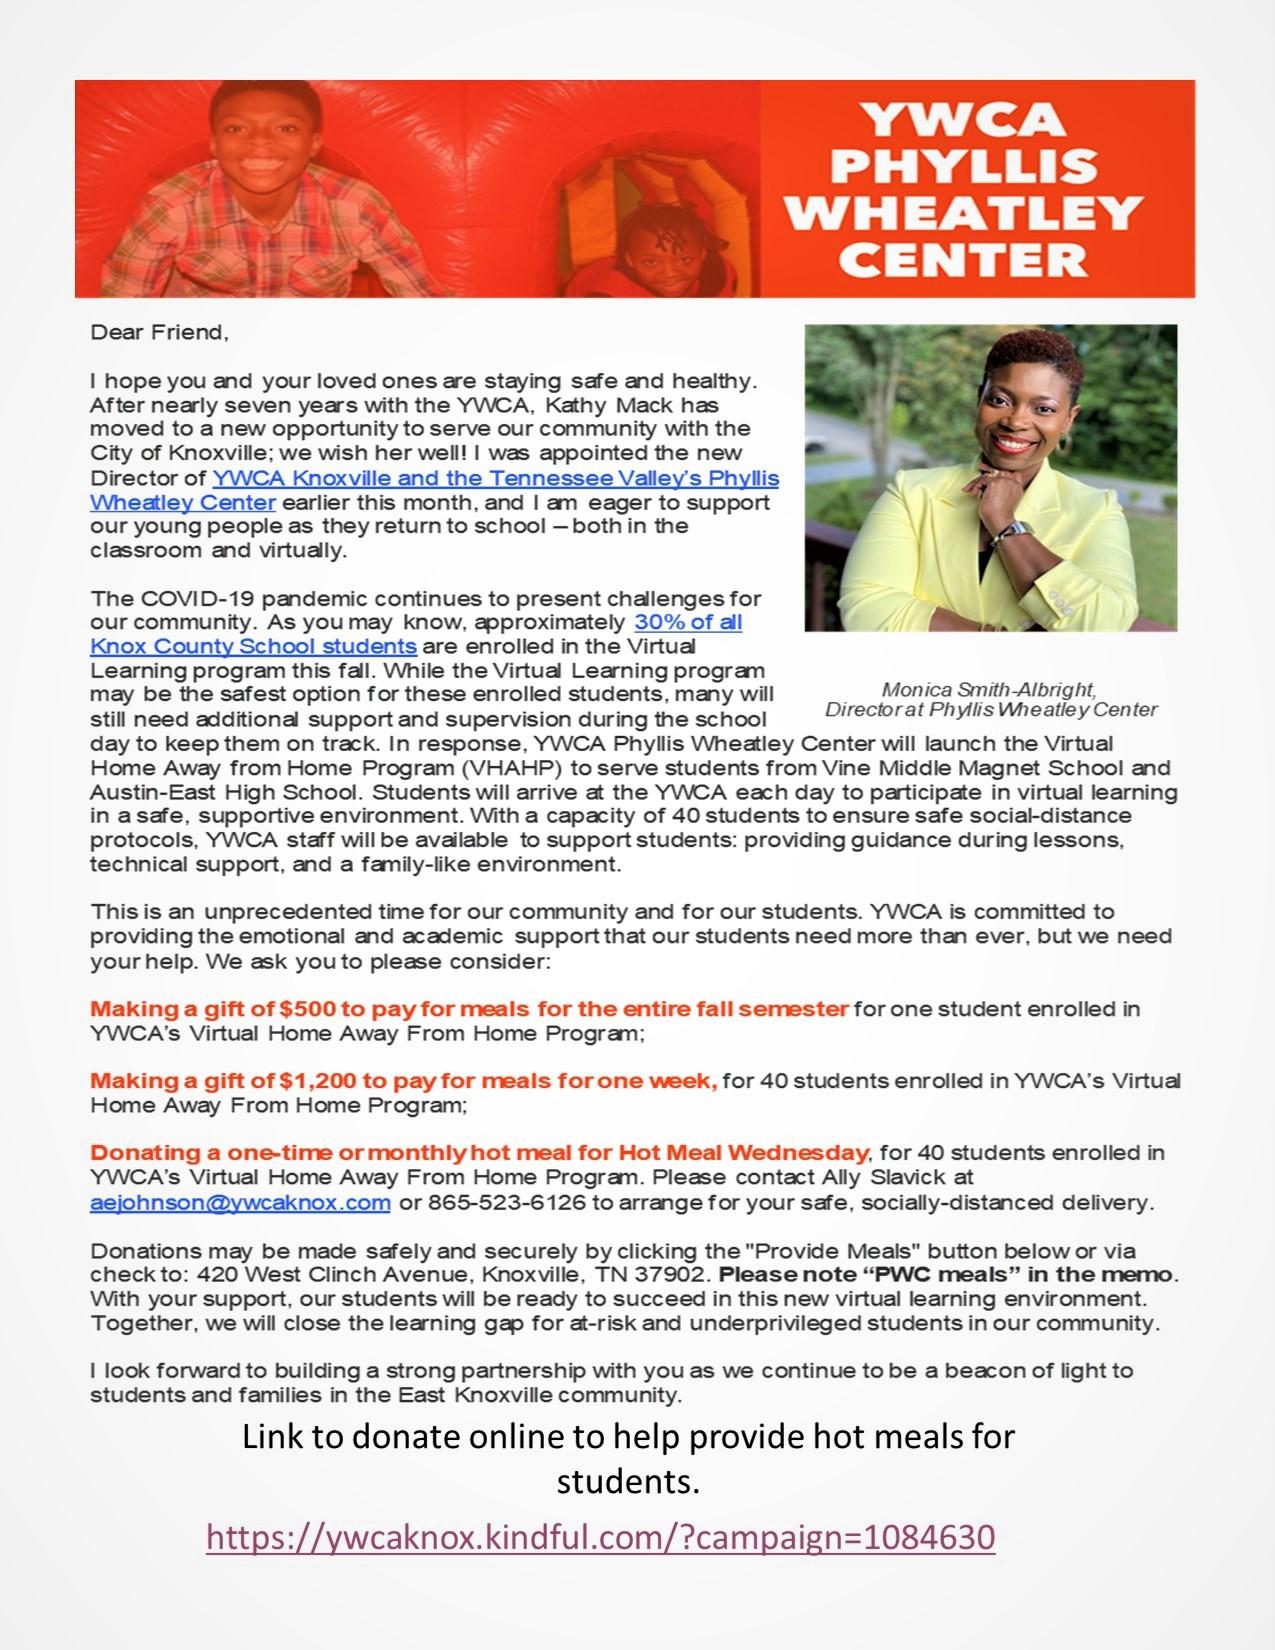 Phyllis Weatley Center